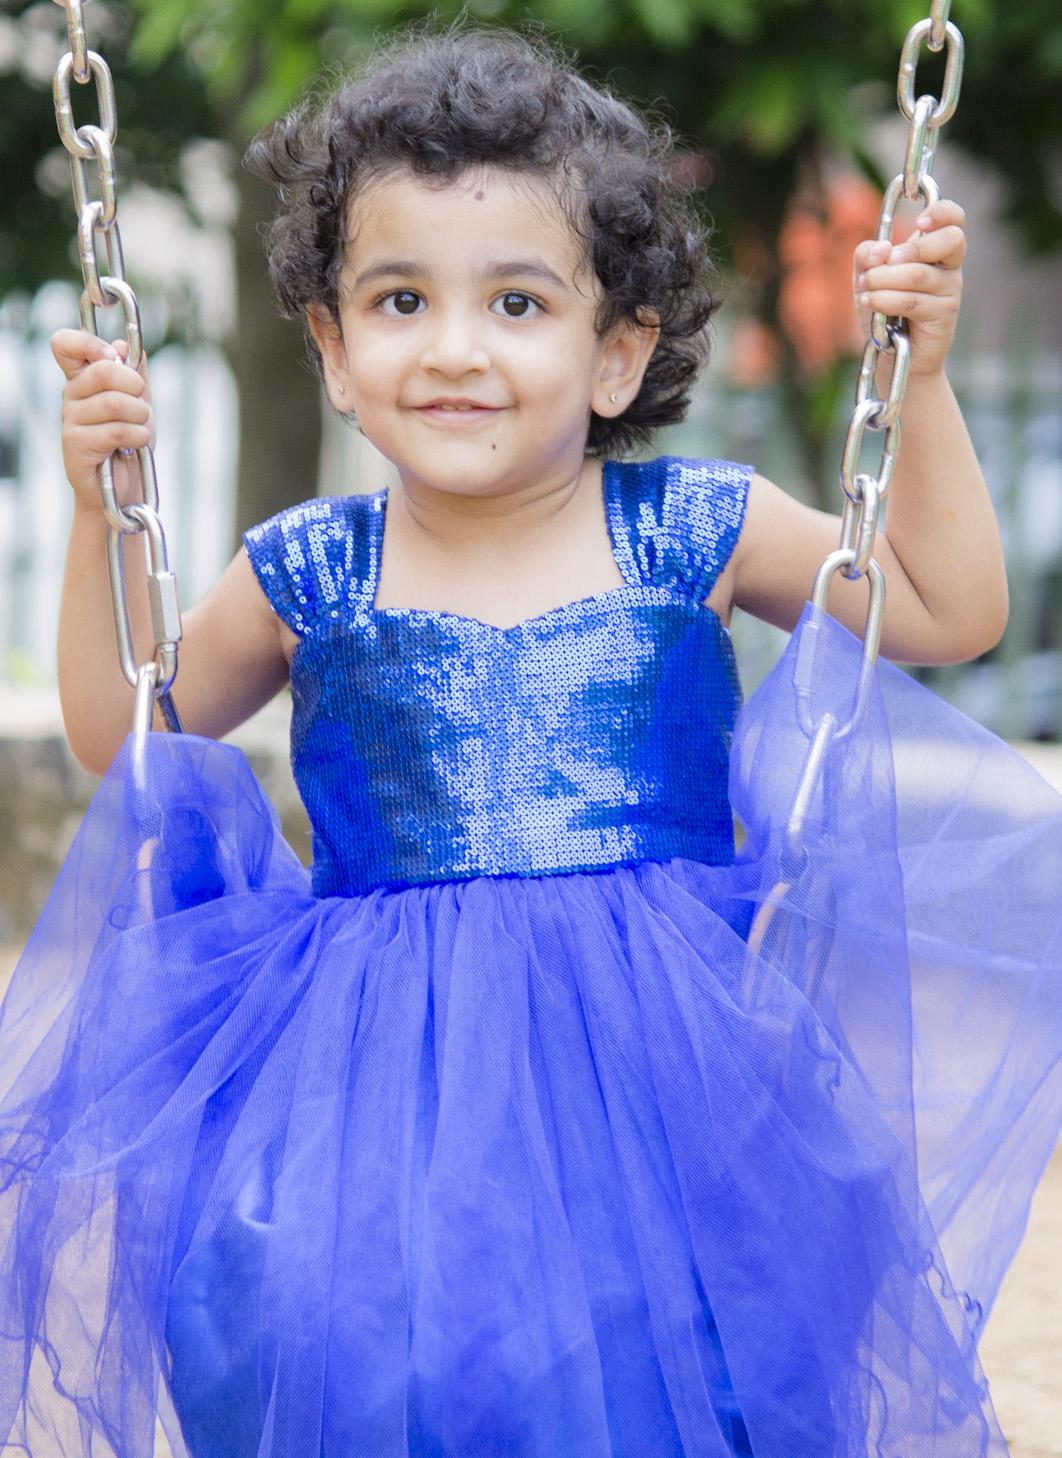 Saanchi Tawde 7